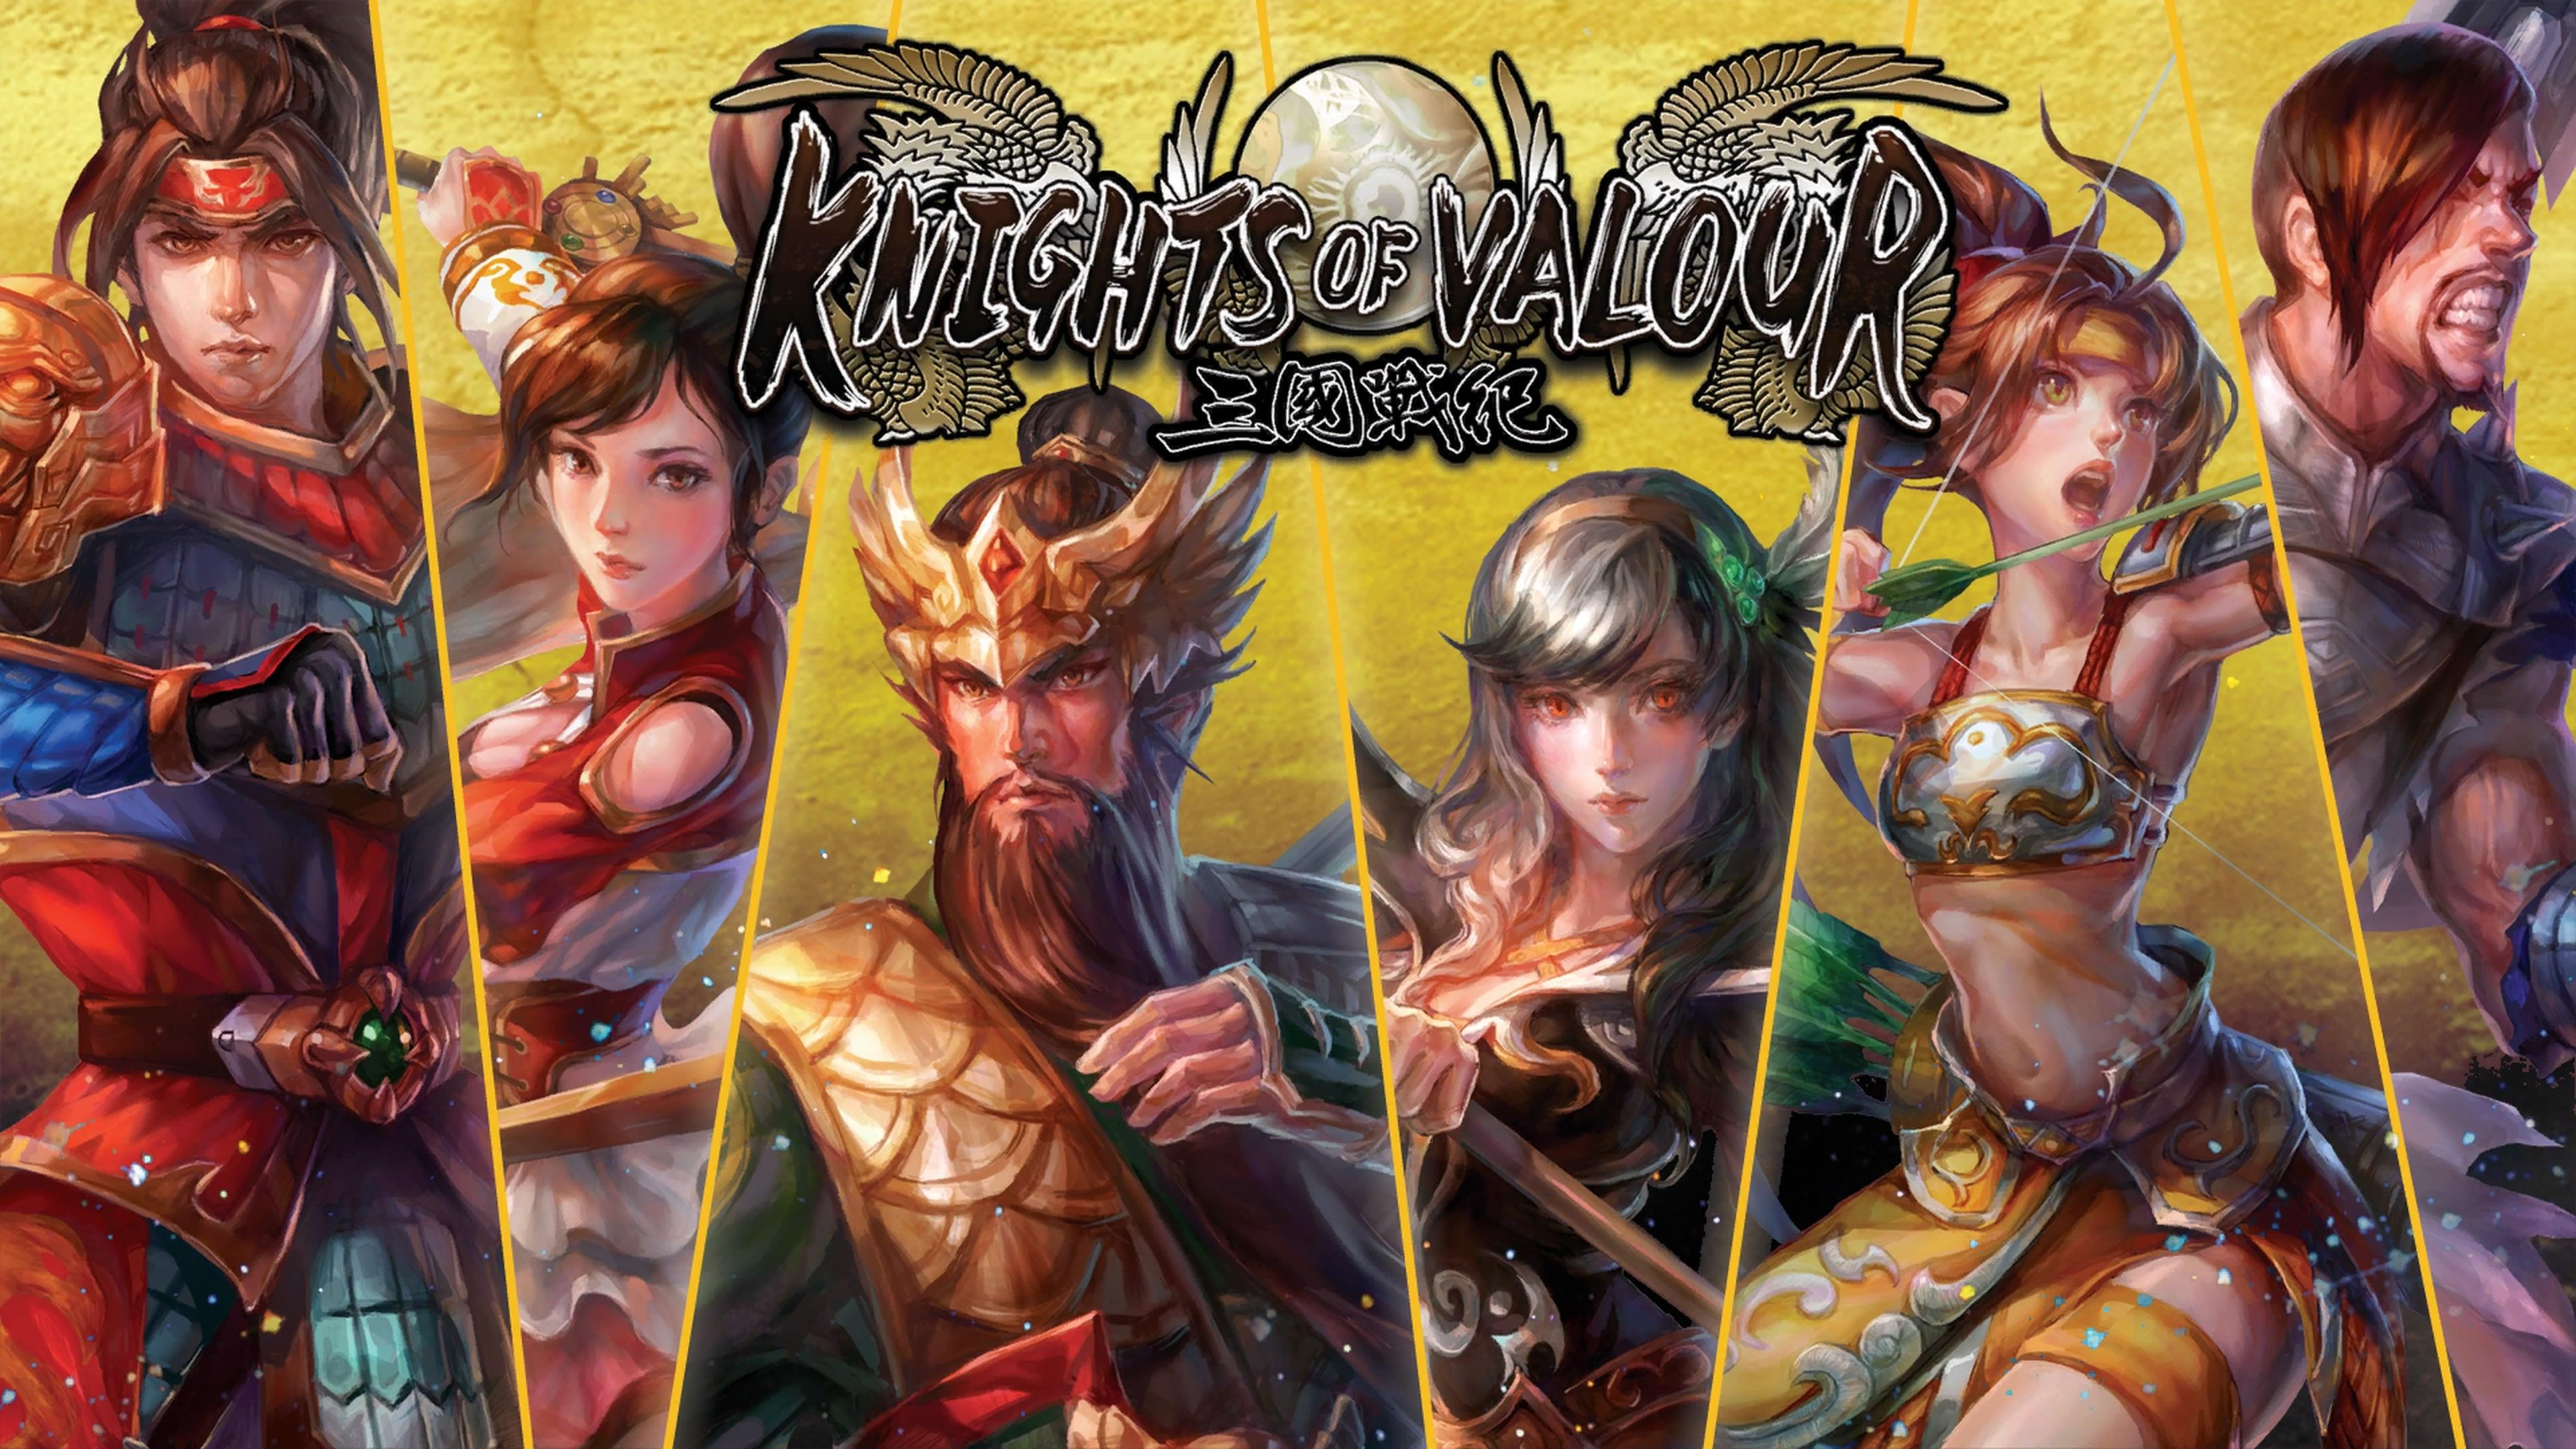 Knights Of Valour (1)